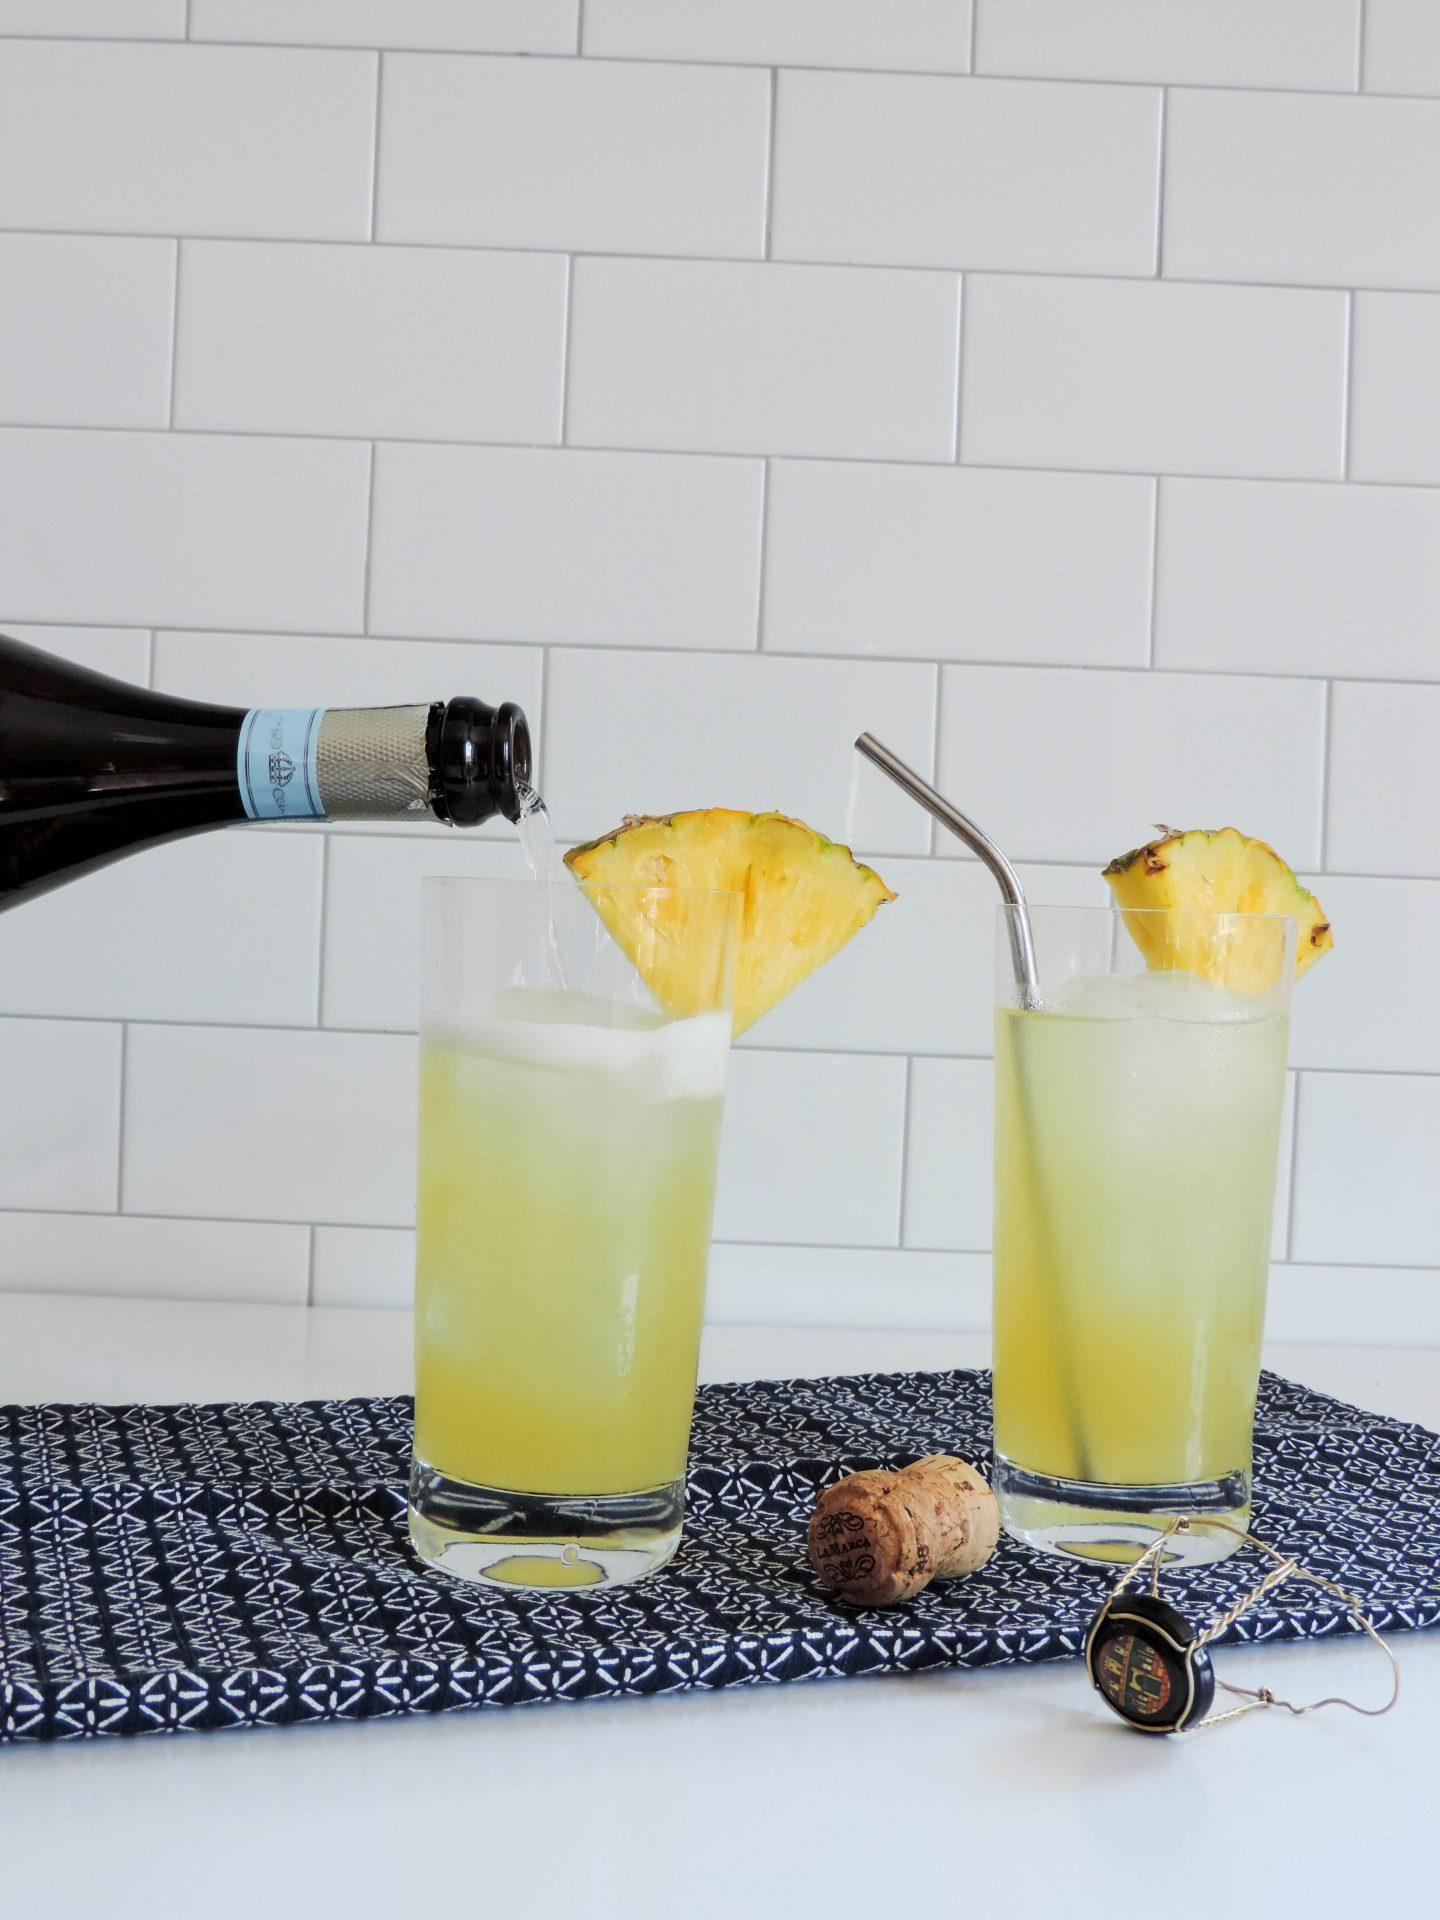 Sparking Pineapple & Vodka Cocktail